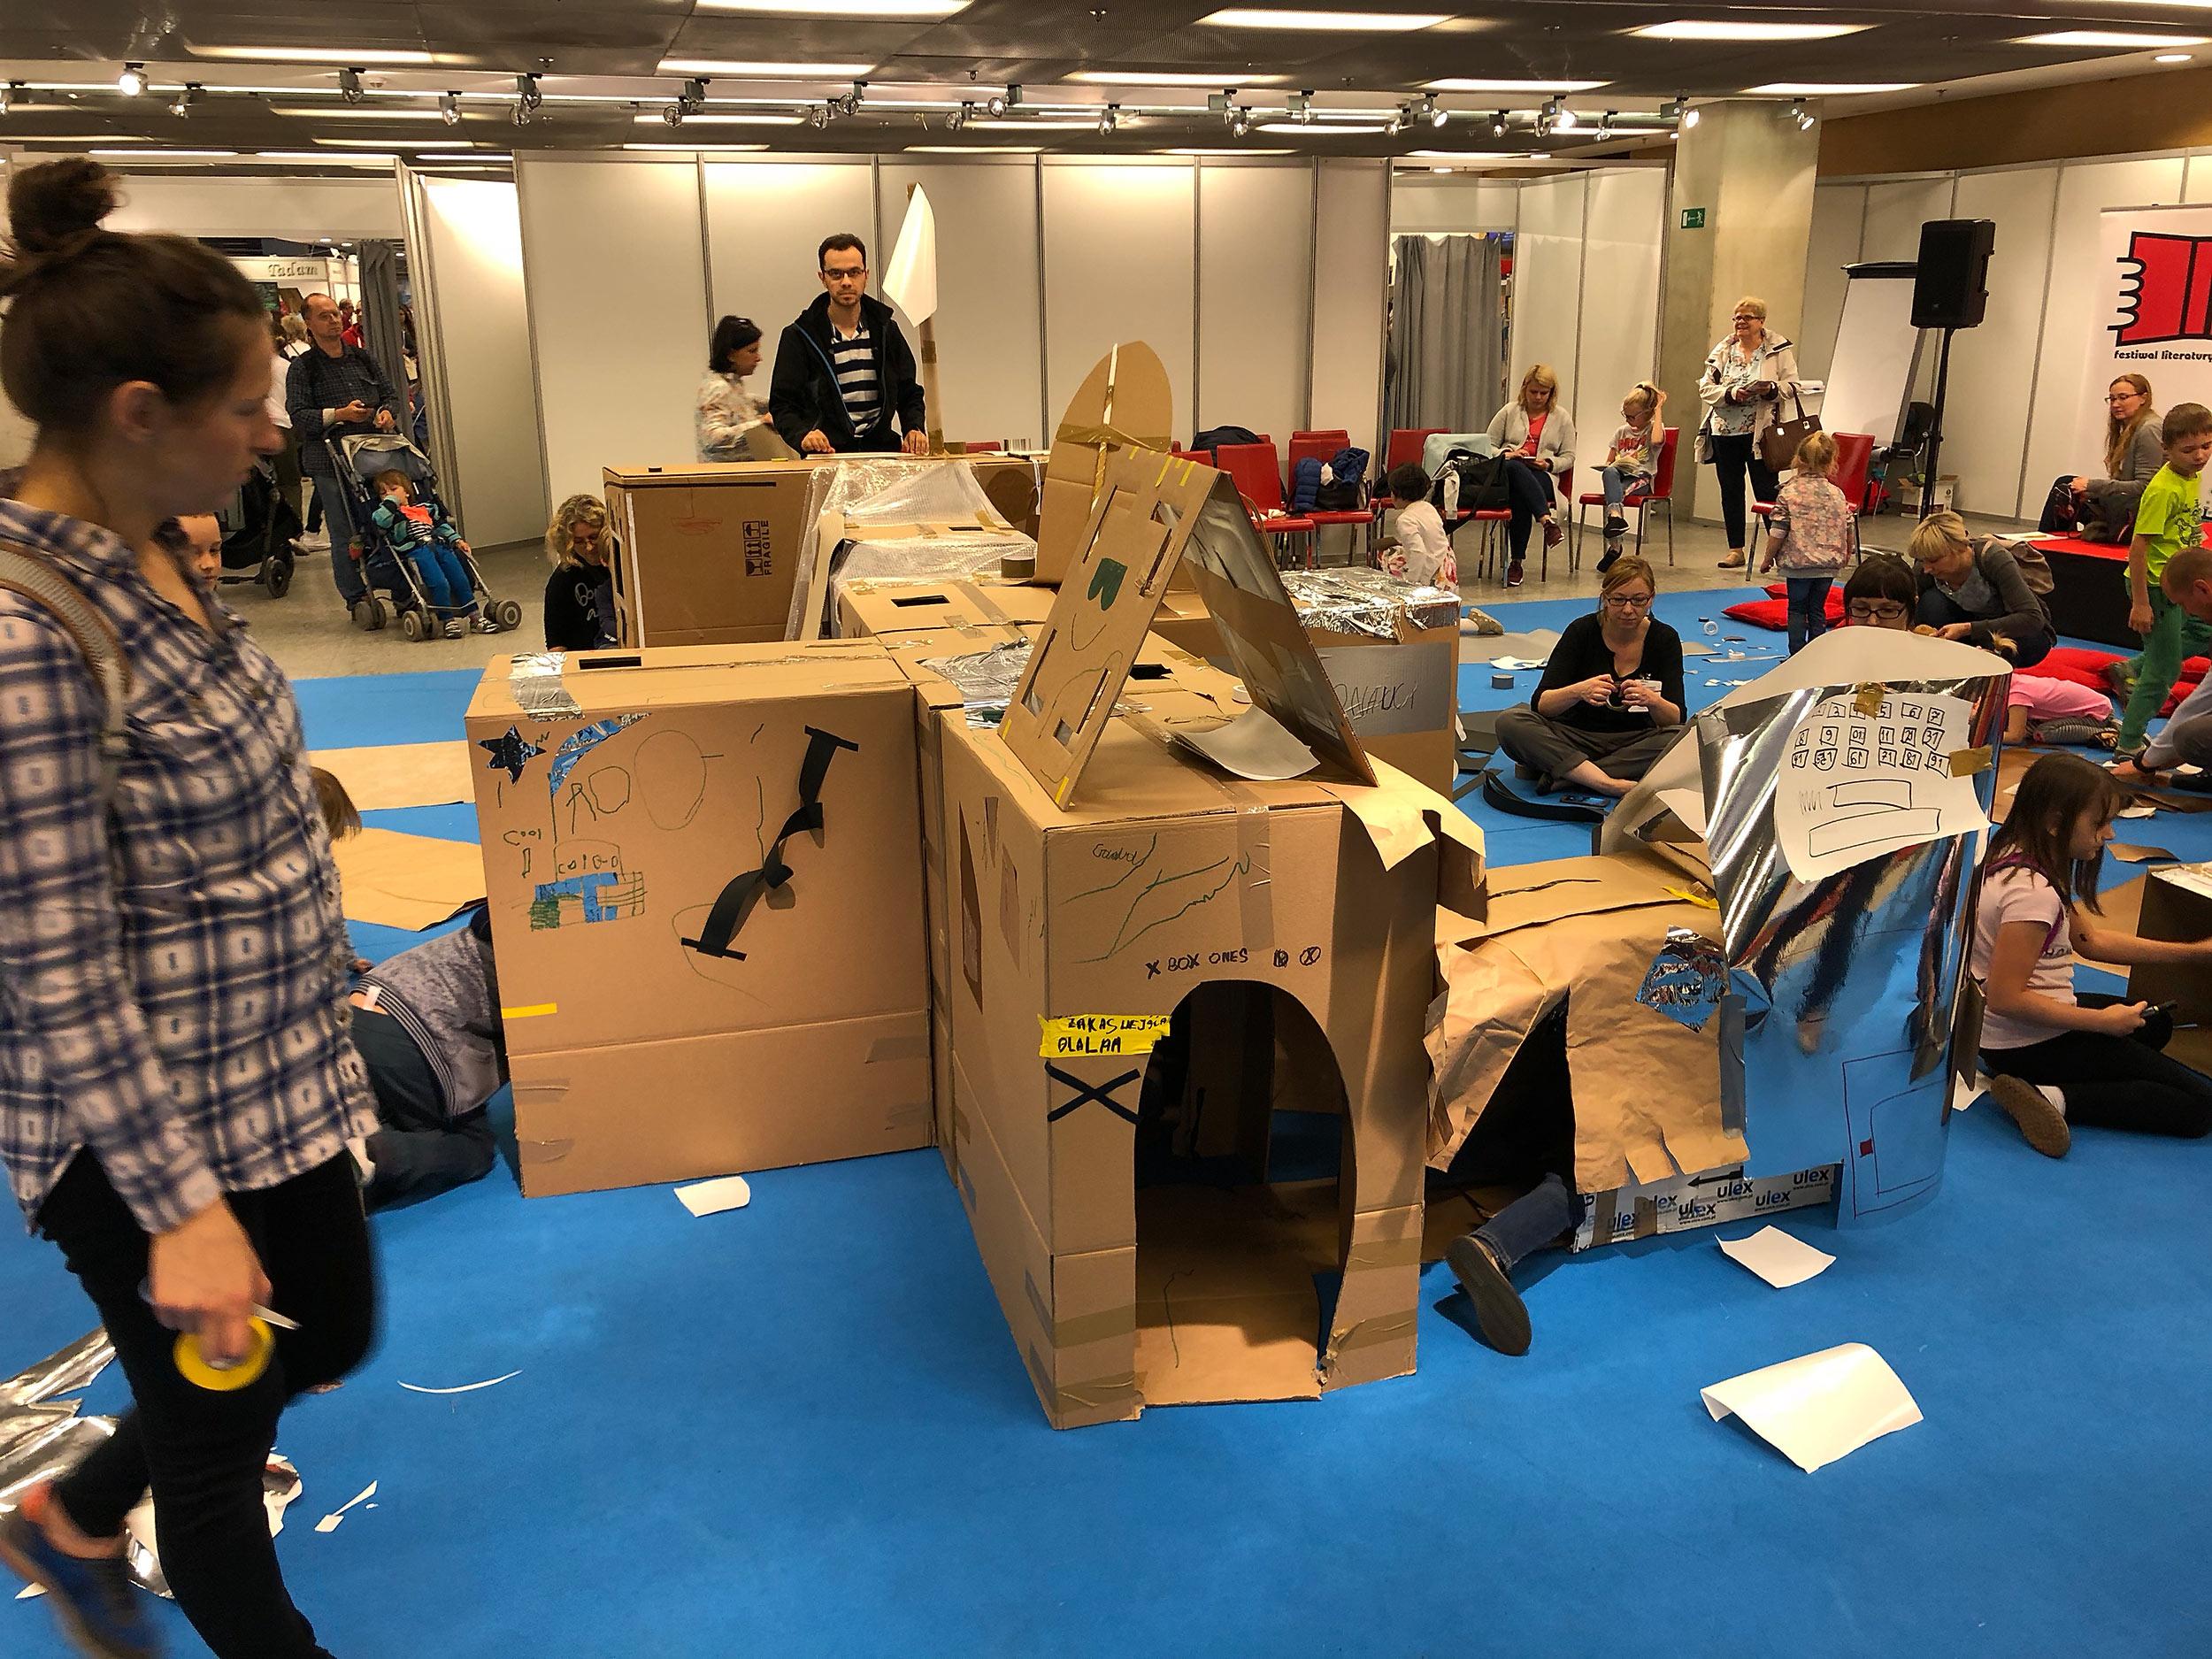 """Tu jesteśmy"" workshop at Warsaw Book Fair"